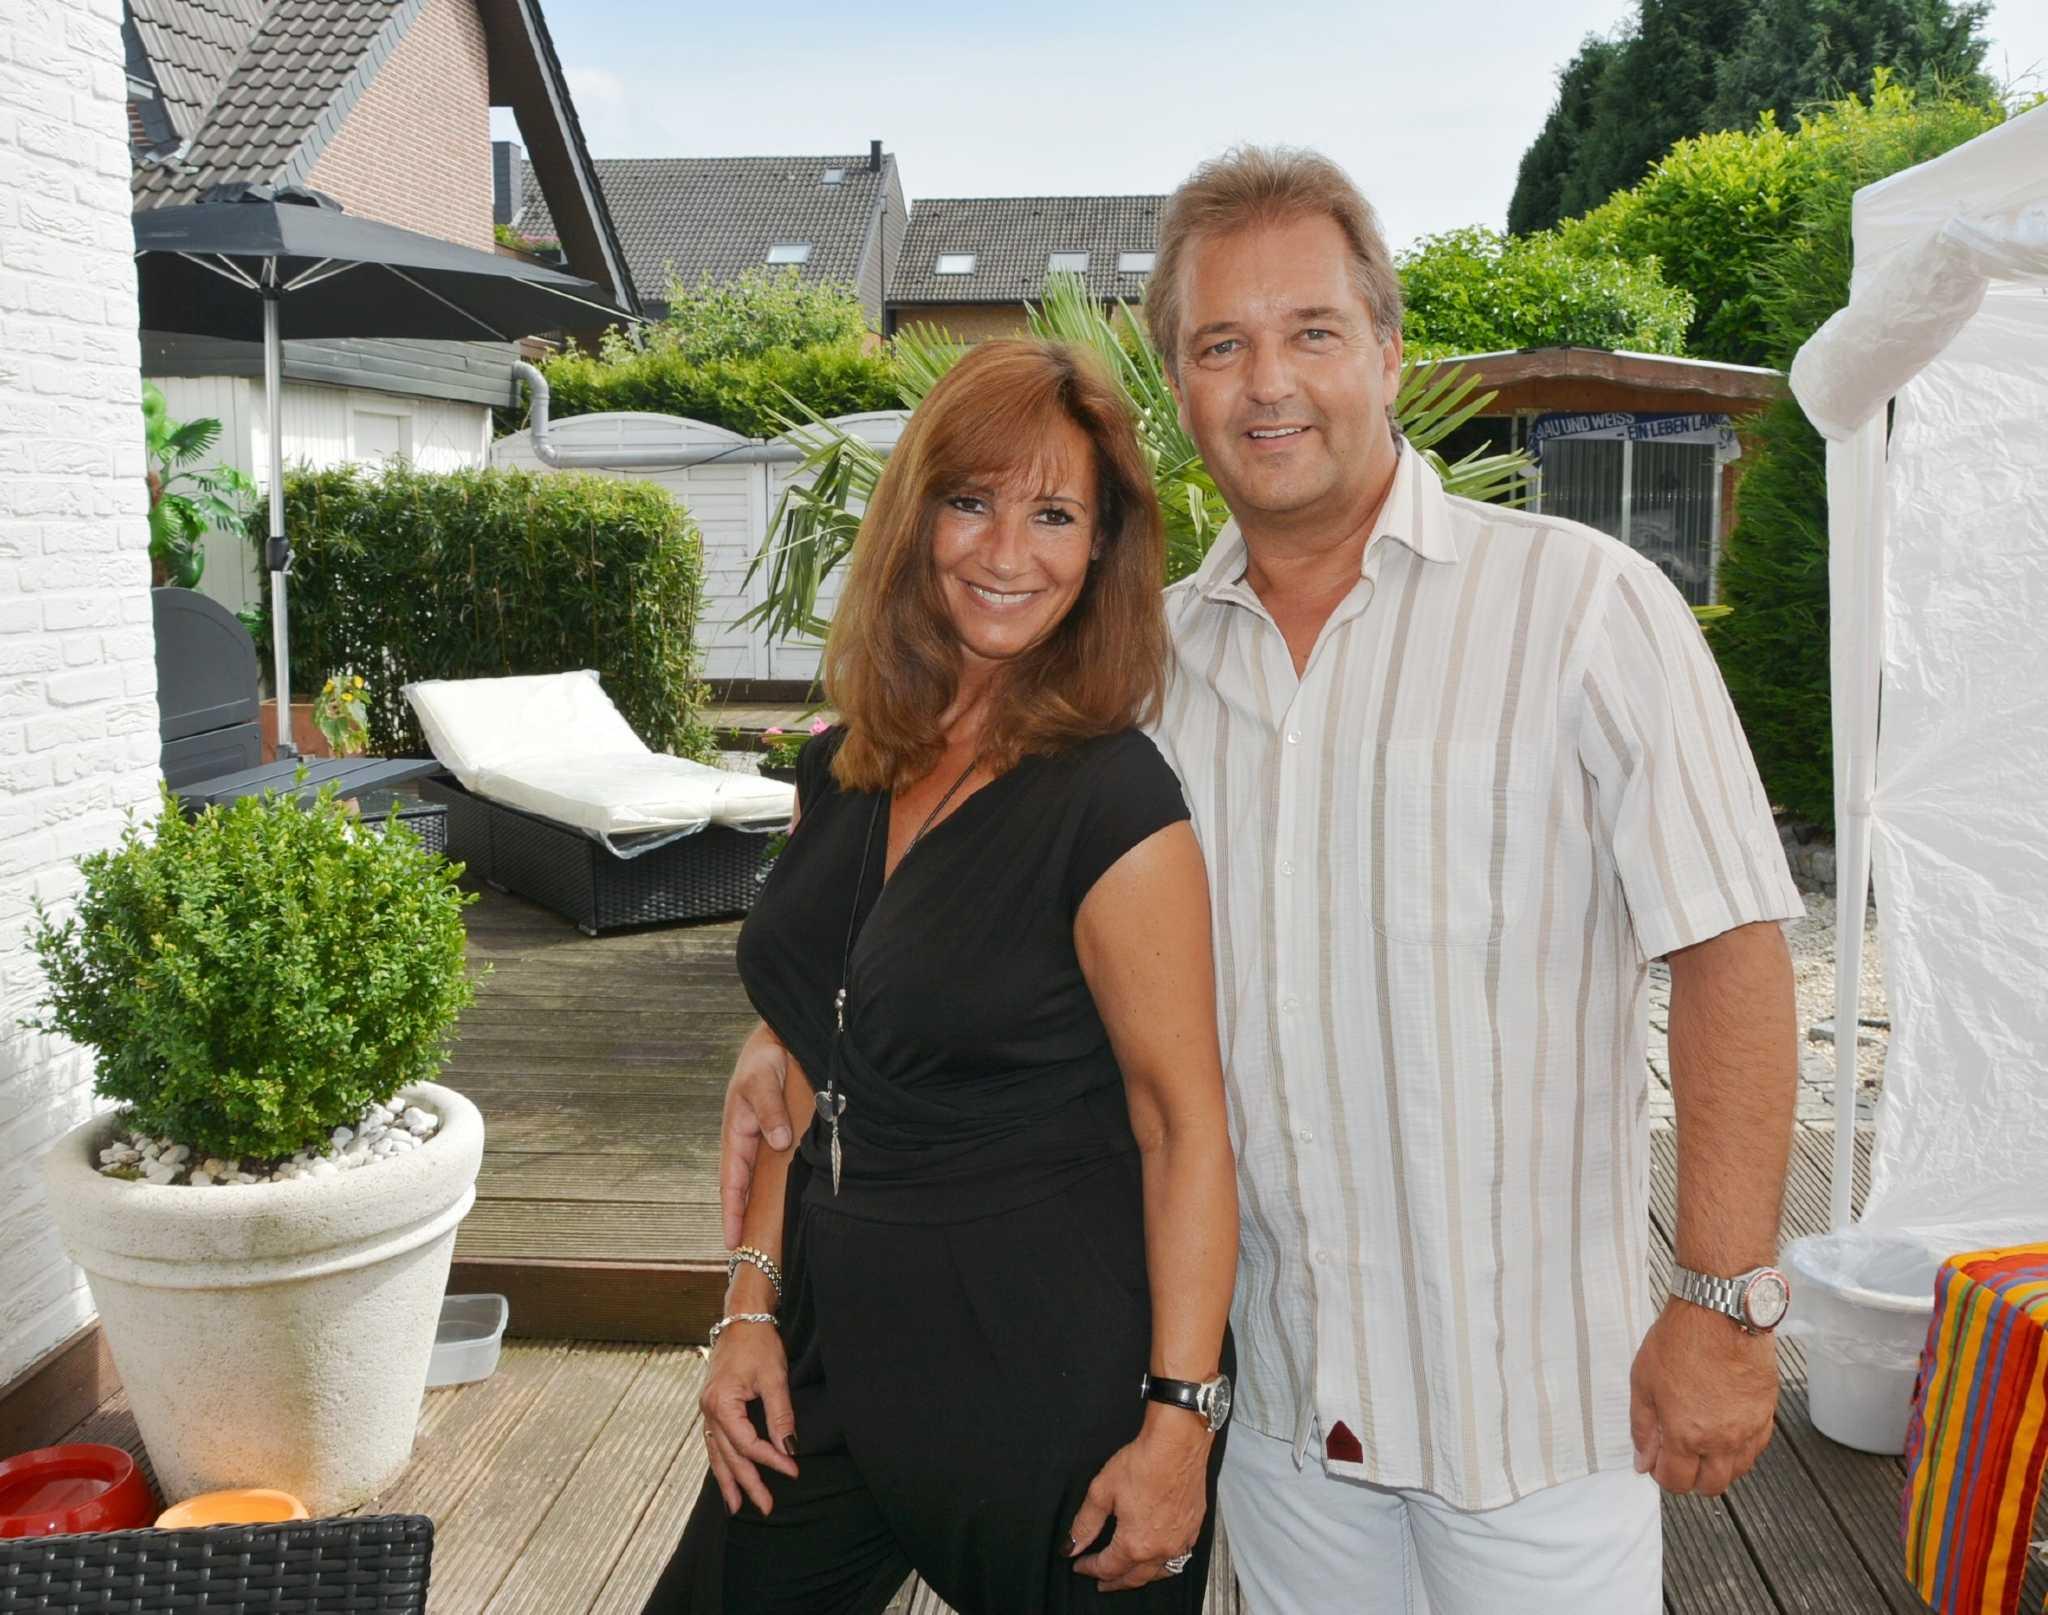 Frank und Petra Hapke